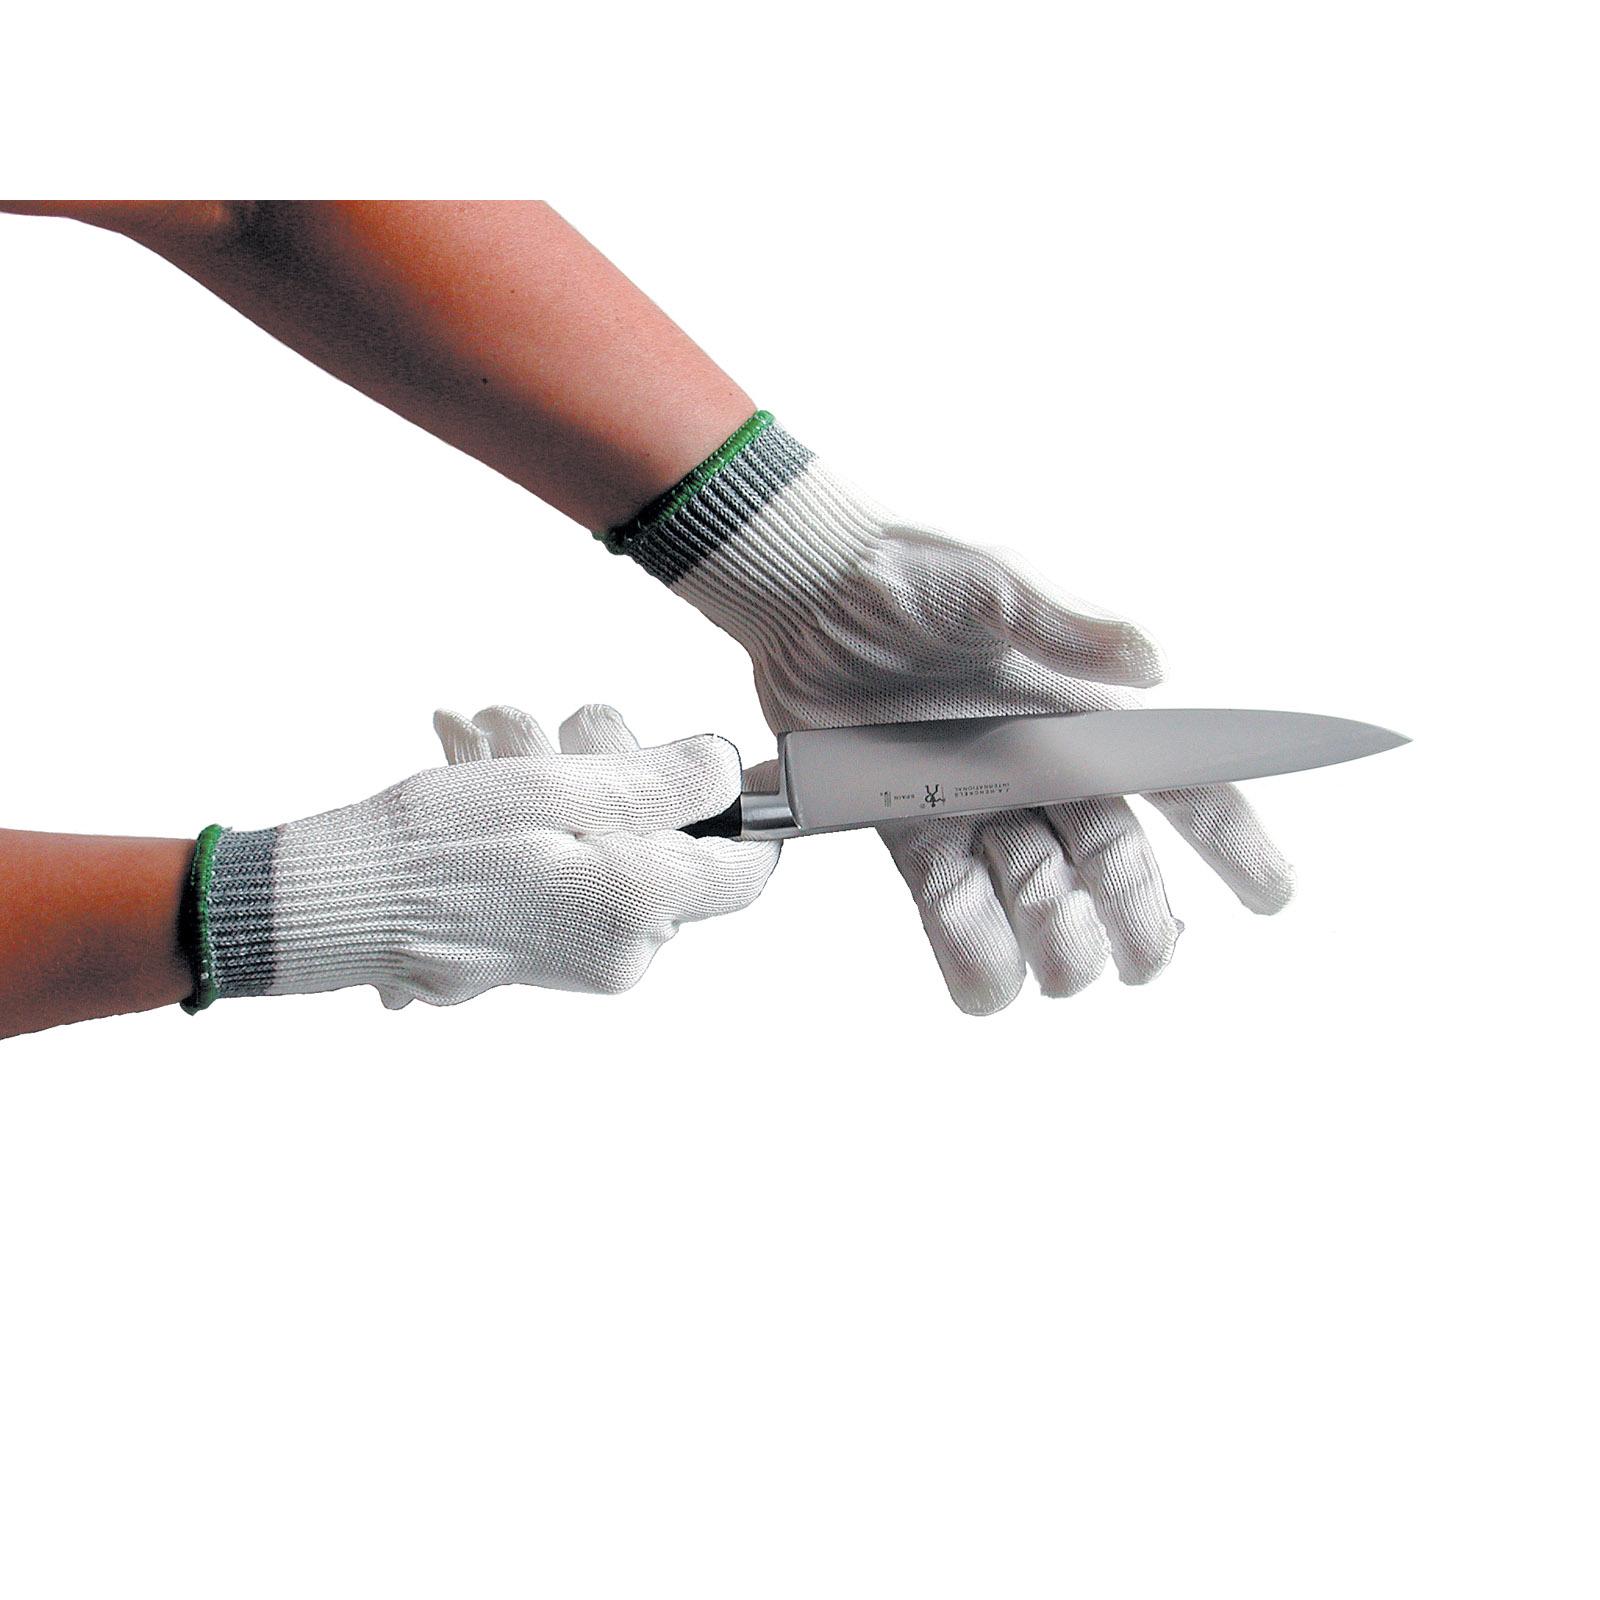 San Jamar SG10-XL glove, cut resistant